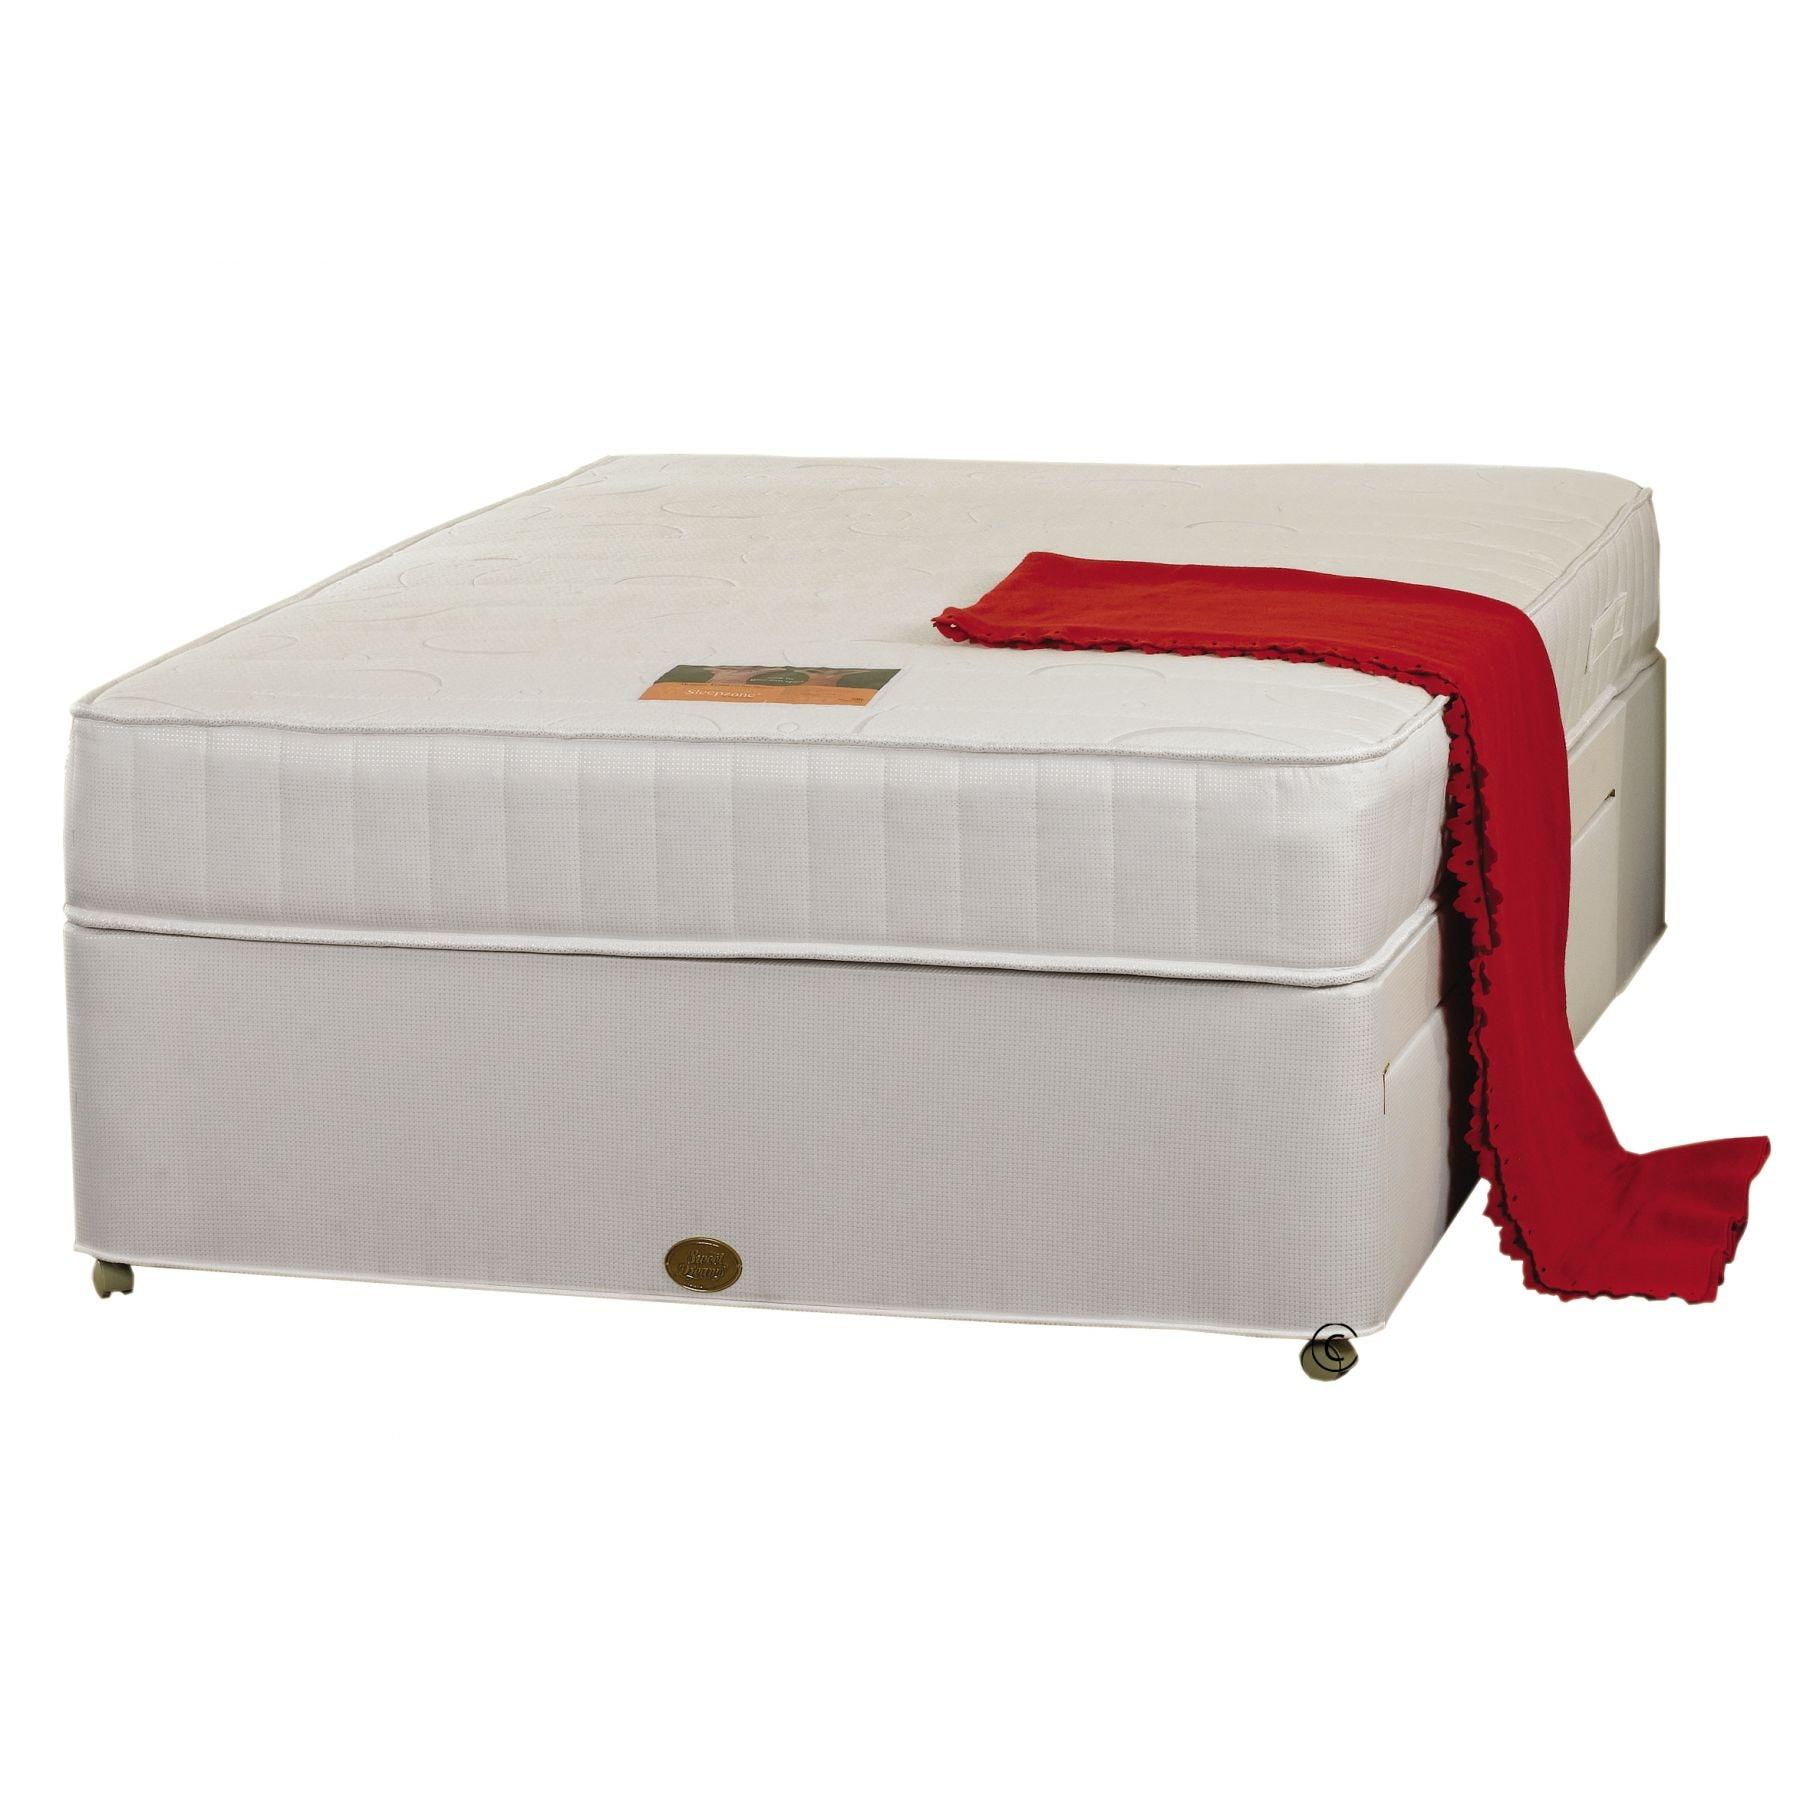 Memory zone divan base mattress for Divan mattress sale